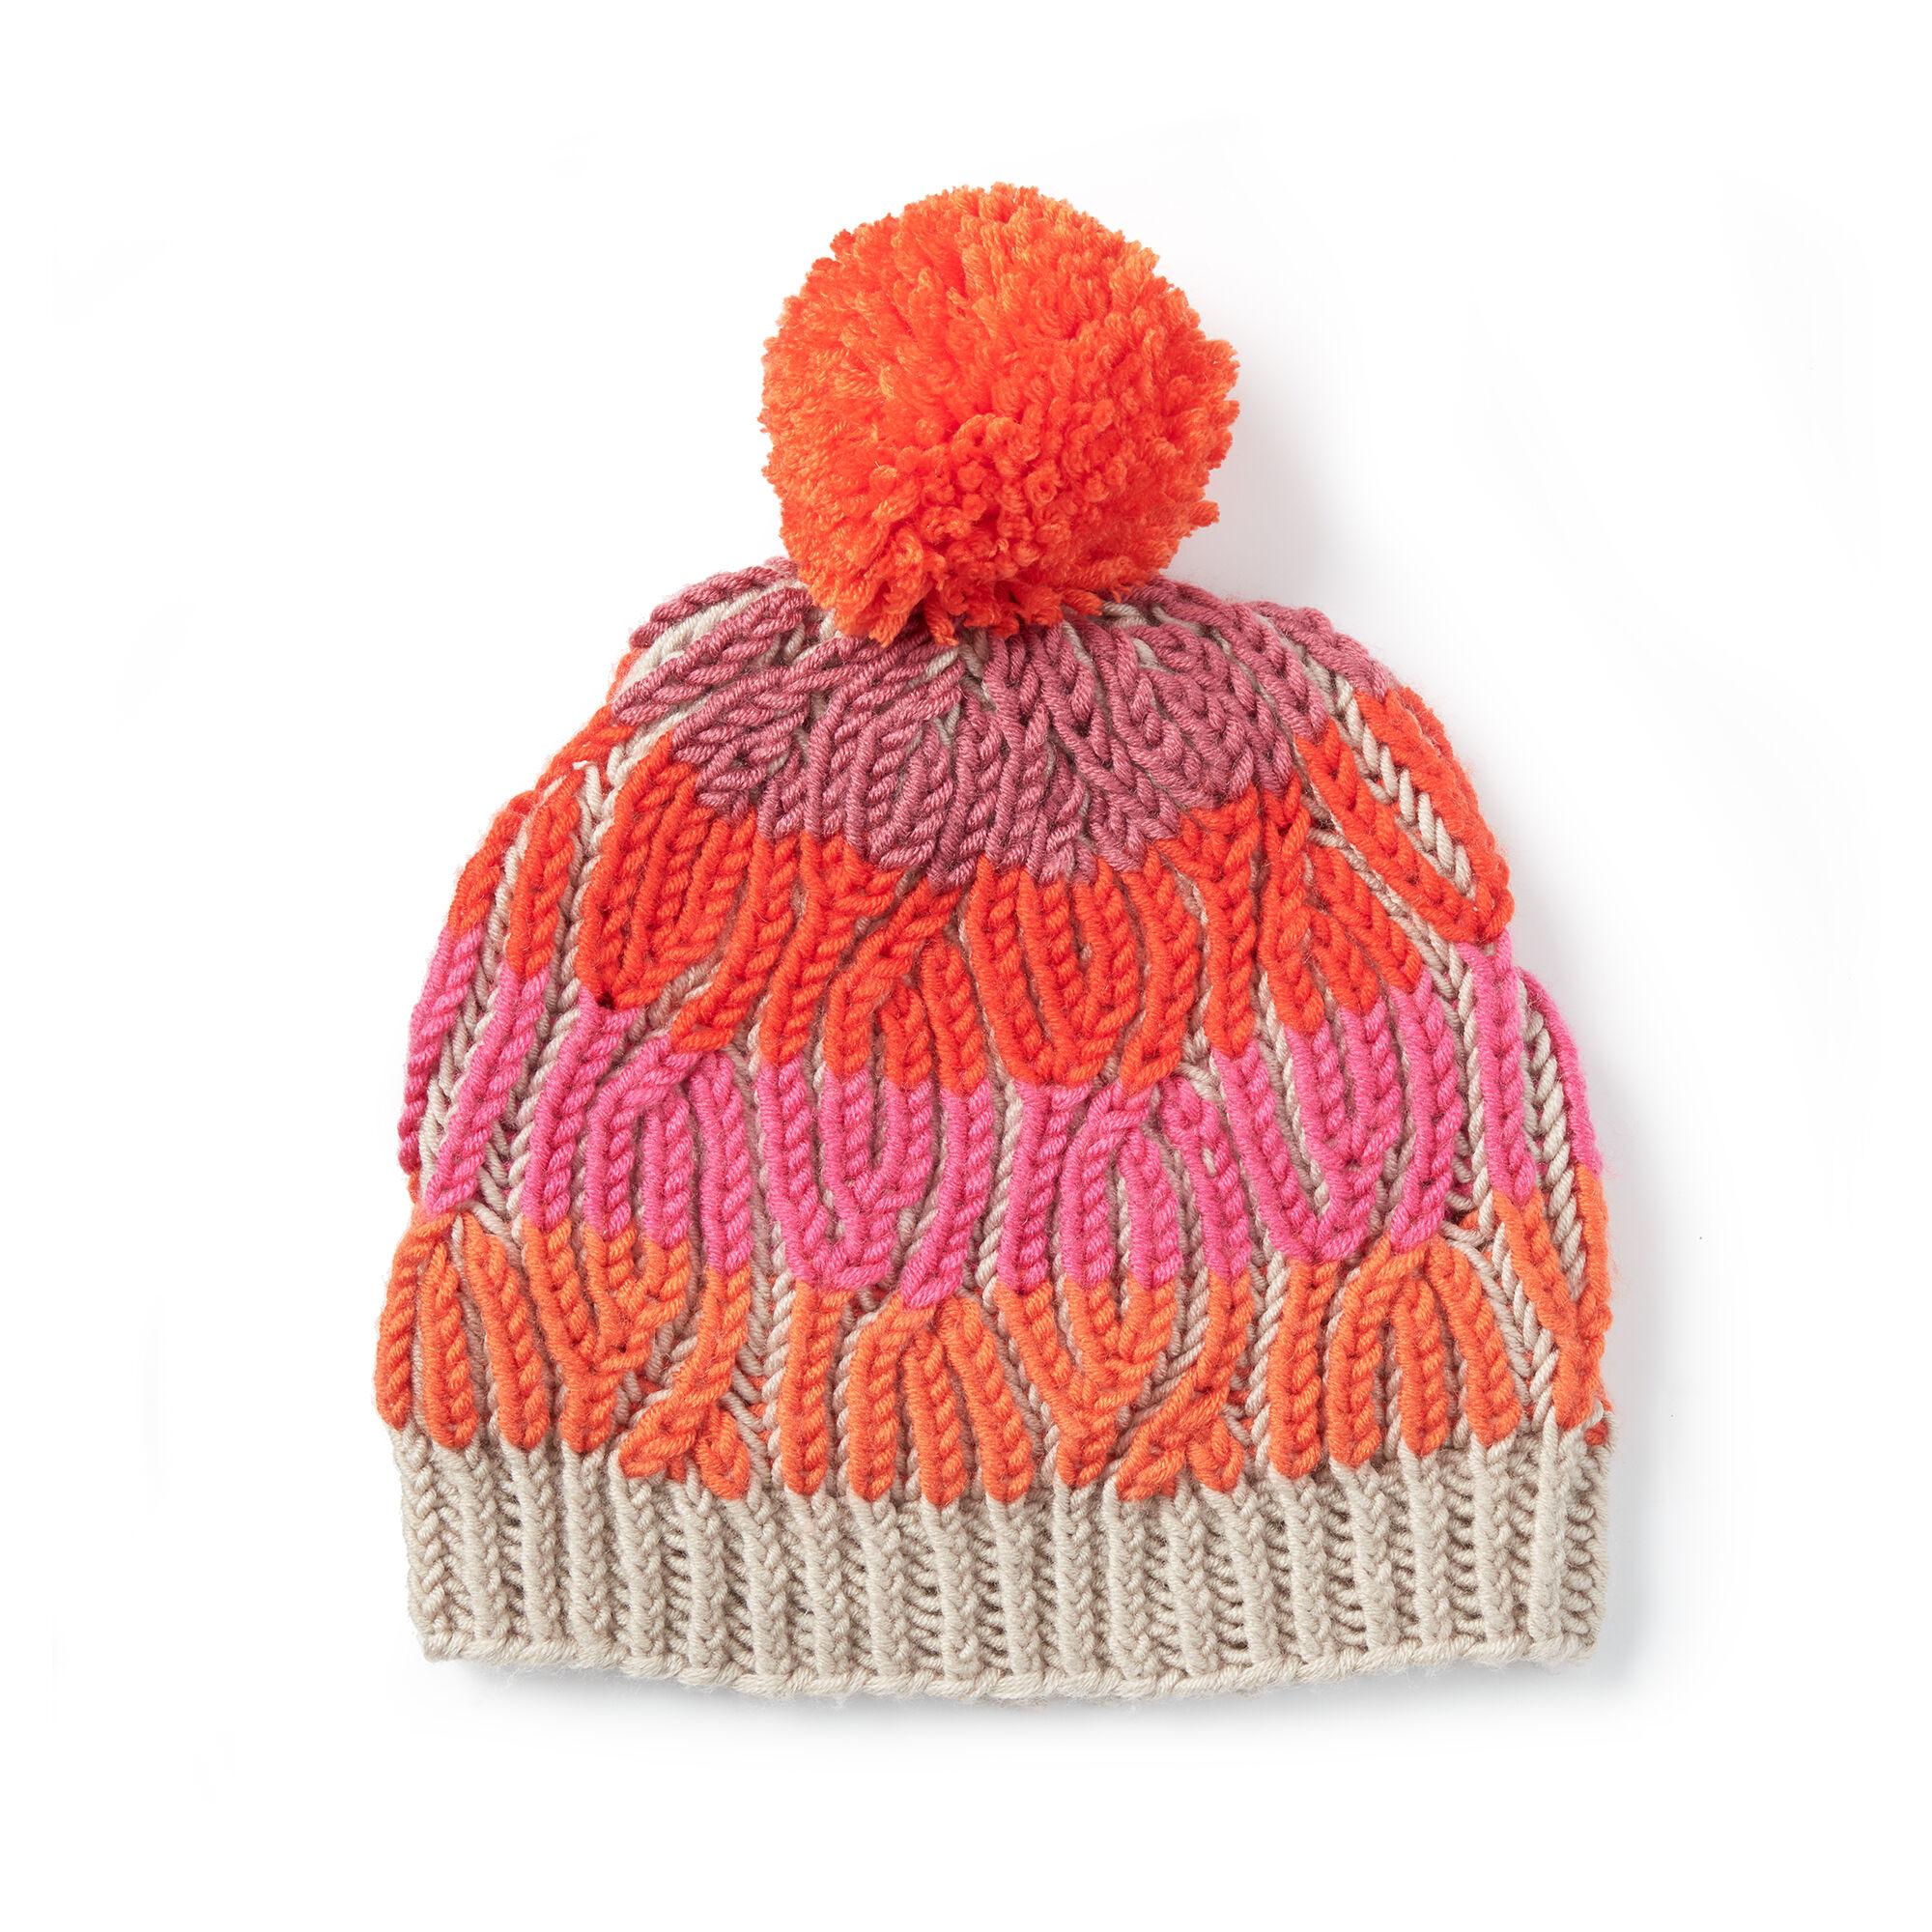 Caron x Pantone Brioche Cables Knit Hat Pattern  69b970042030